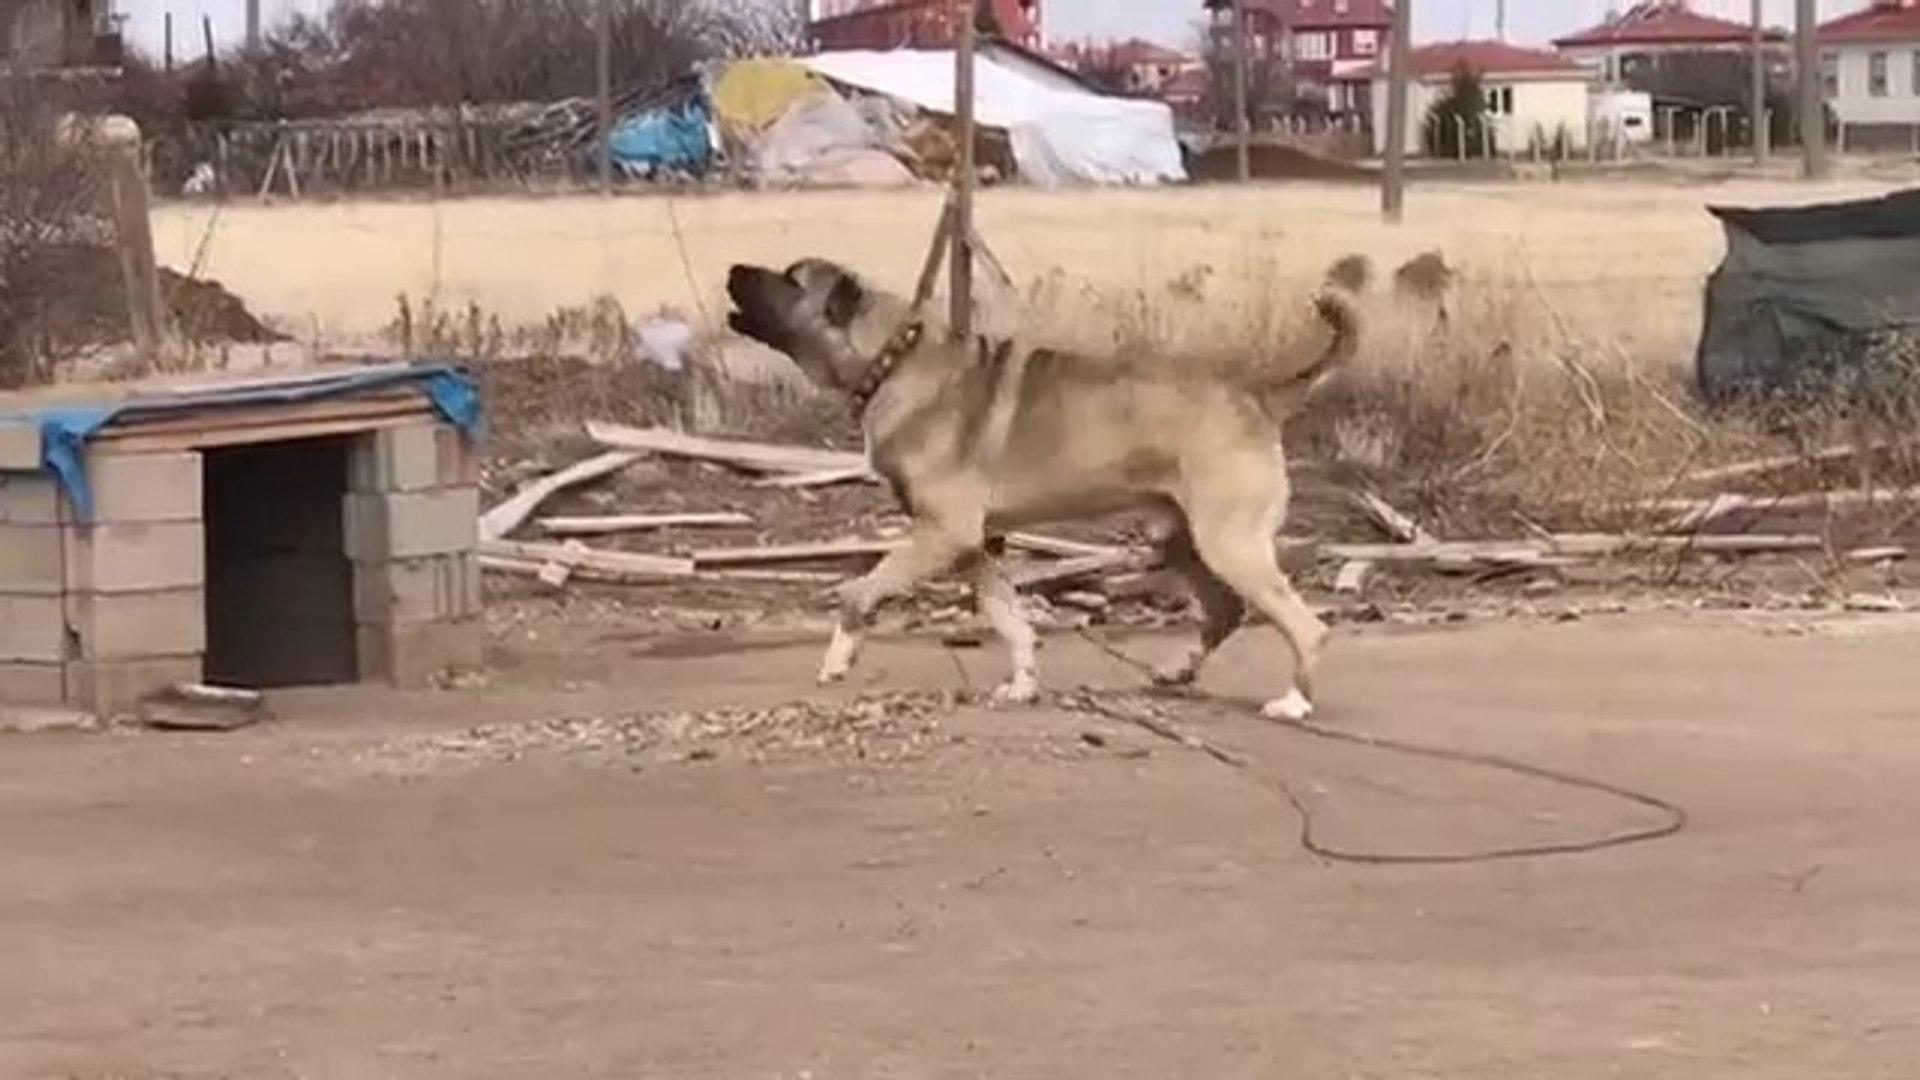 DEVLERDEN ADAMCI MALAKLI COBAN KOPEGi - GiANT MALAKLI SHEPHERD DOG